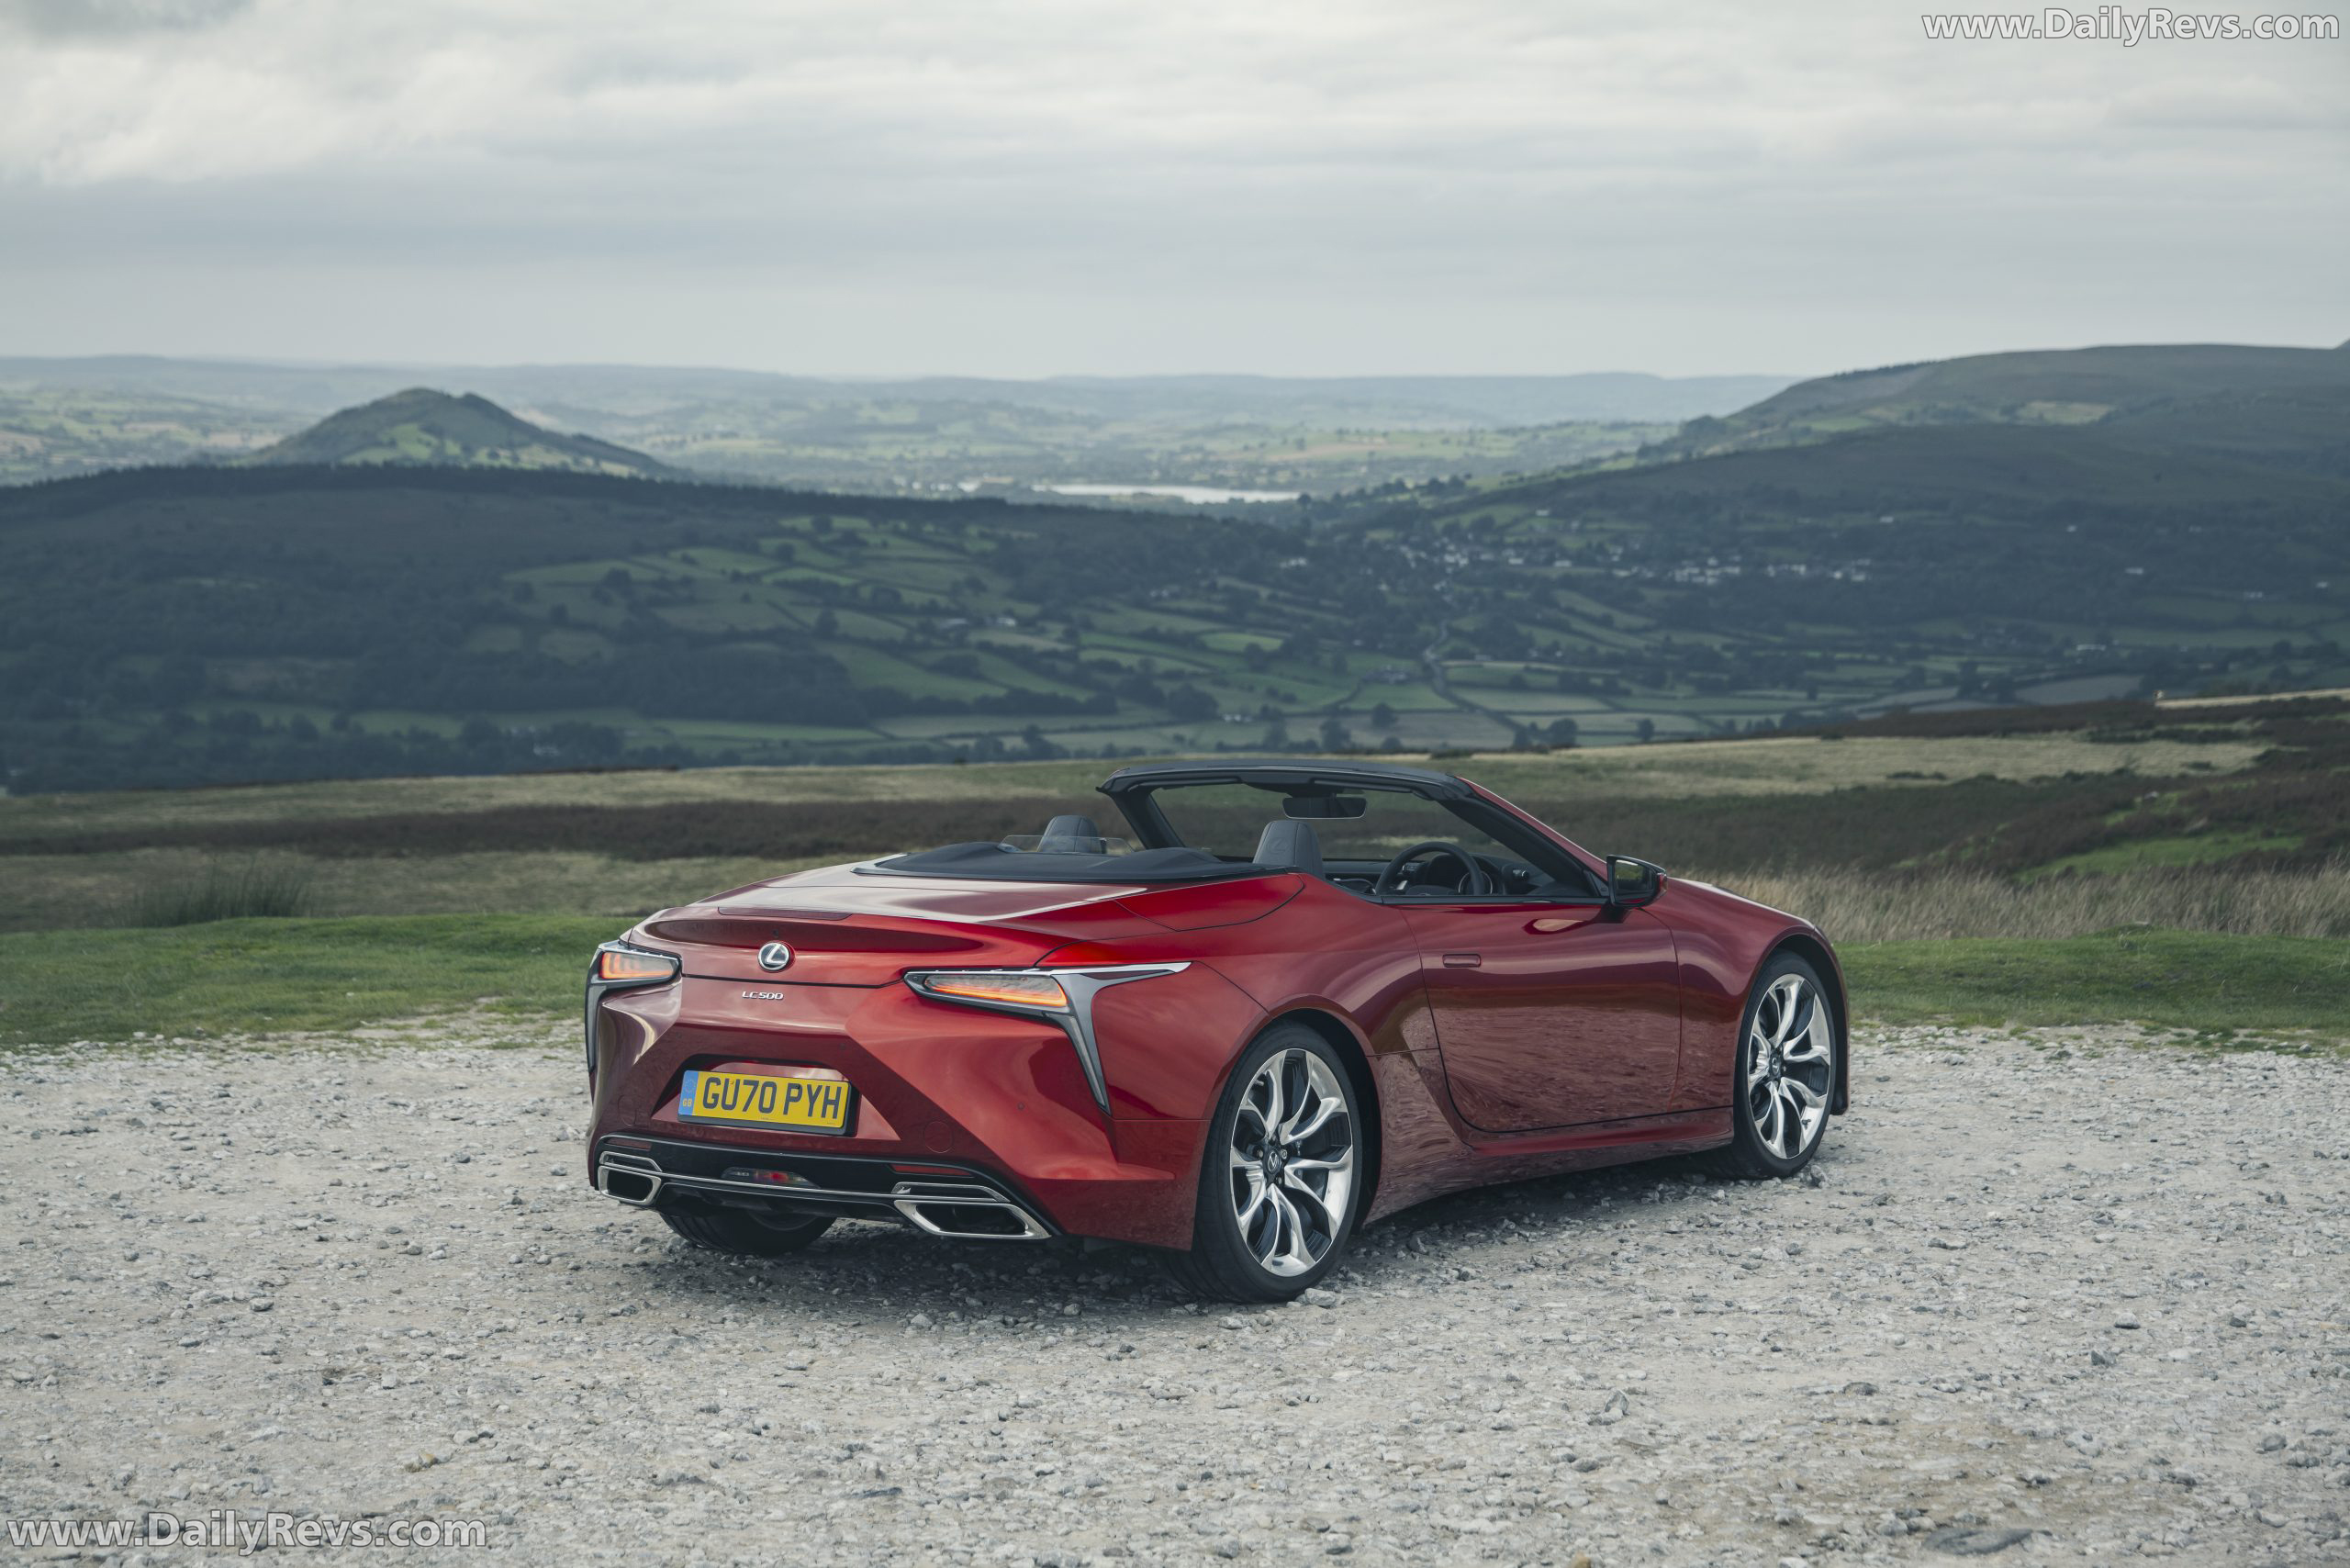 2021 lexus lc 500 convertible uk version - dailyrevs